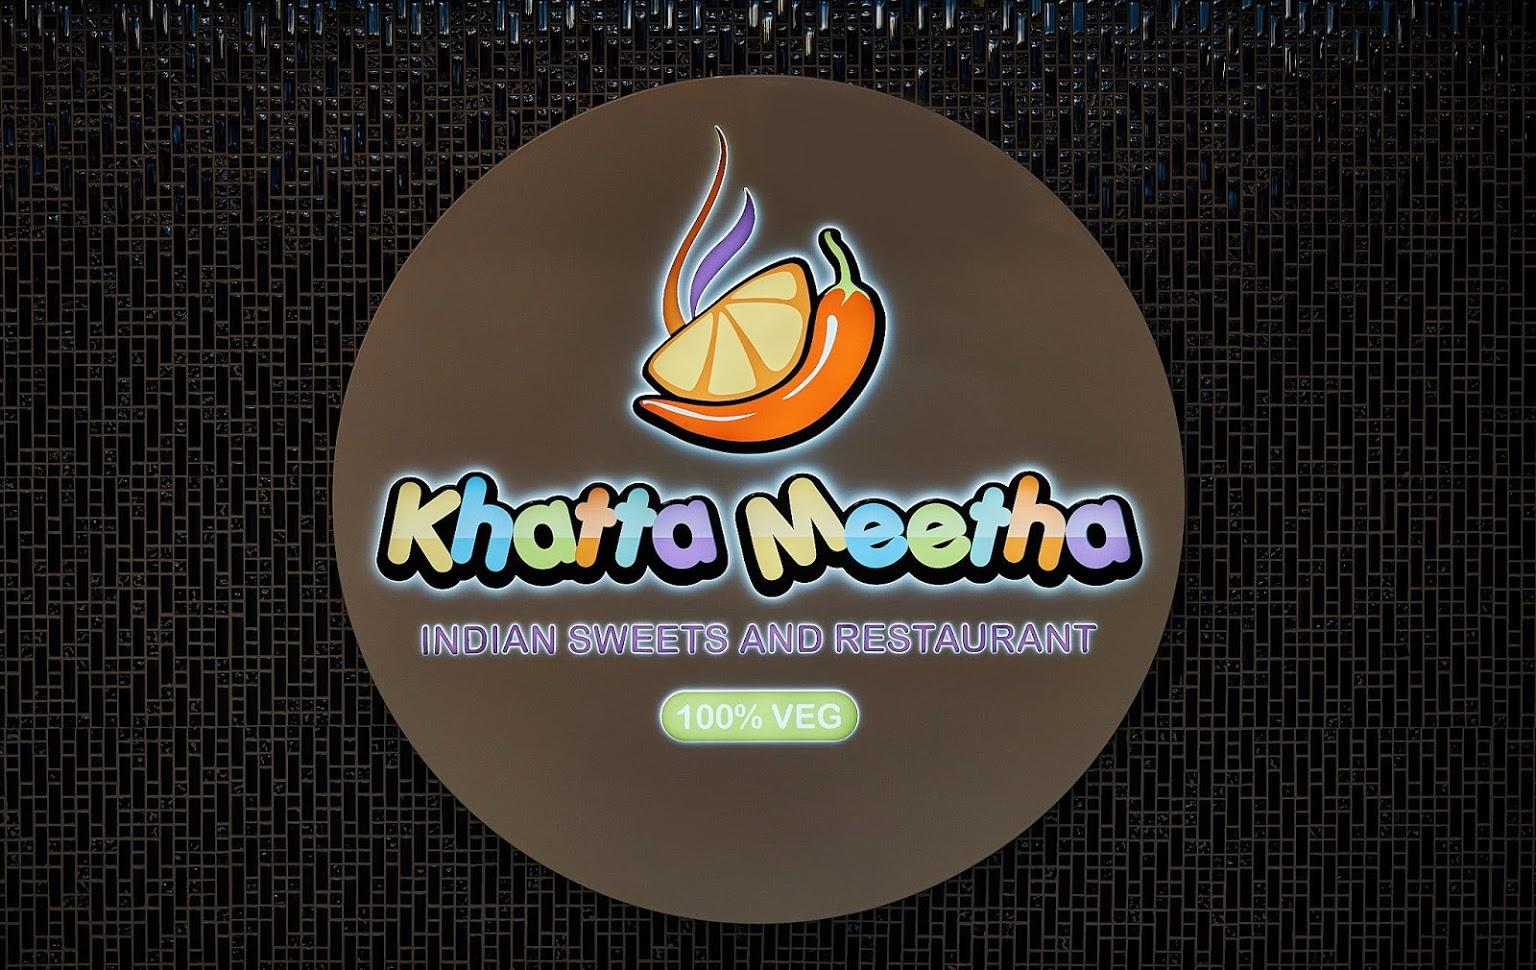 Khatta Meetha signage